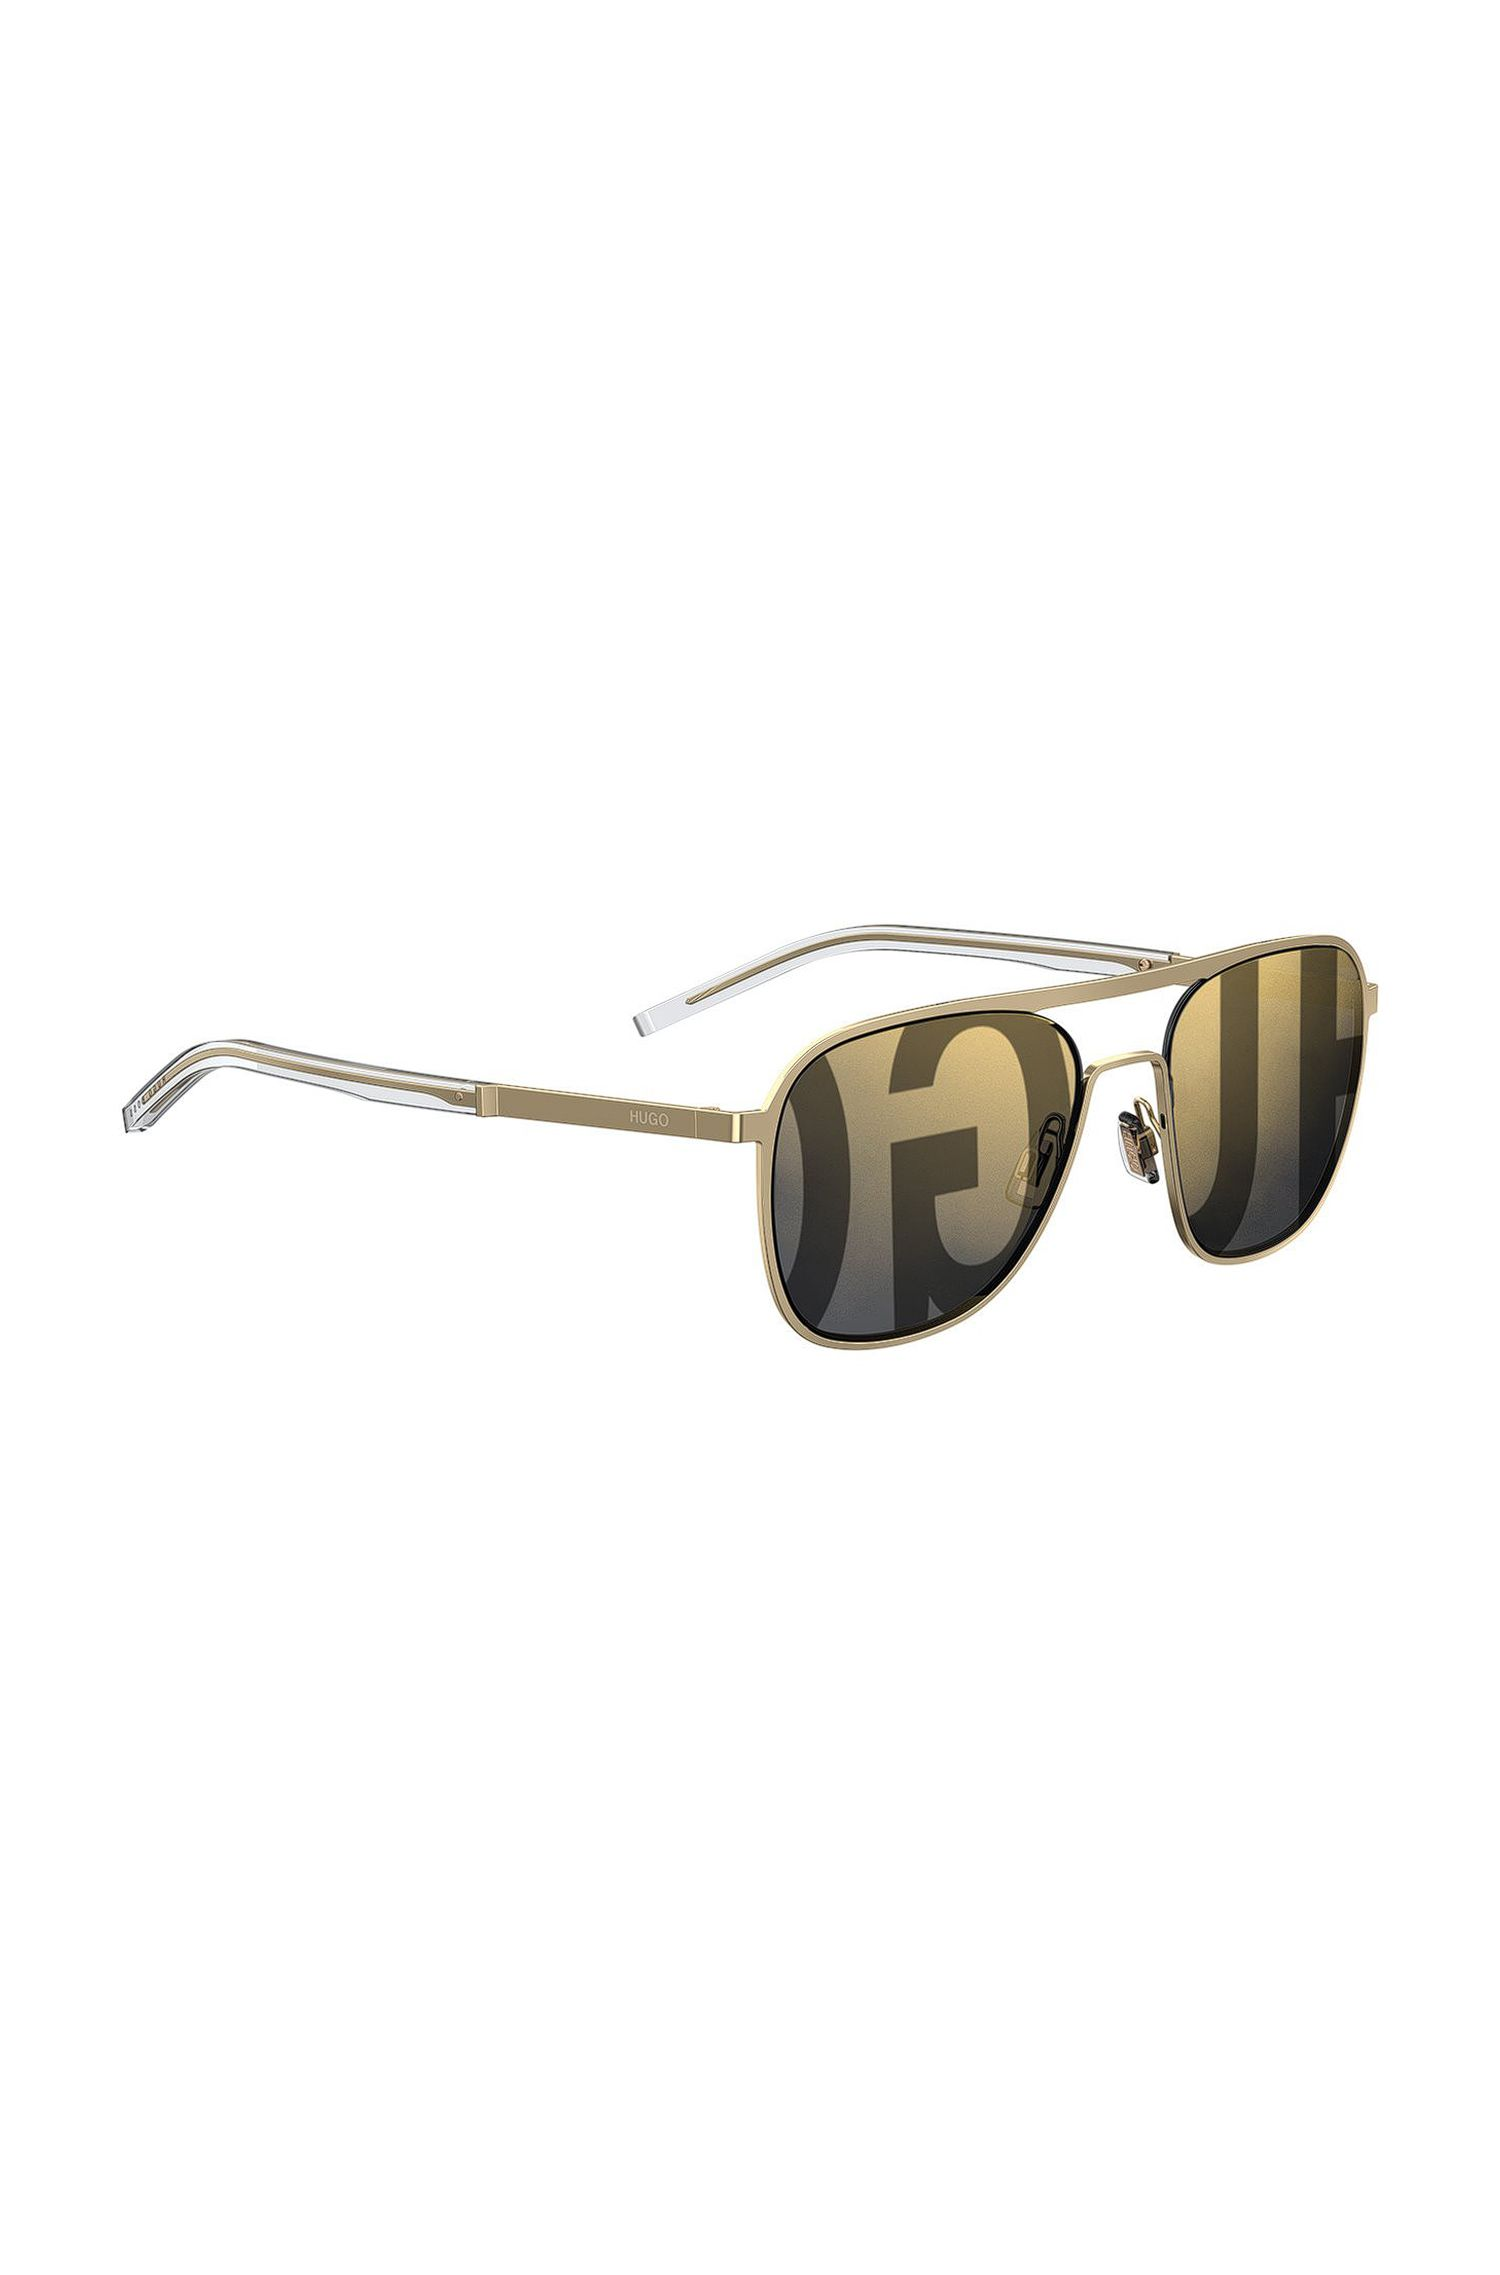 Gold-tone aviator sunglasses with logo lenses, Gold